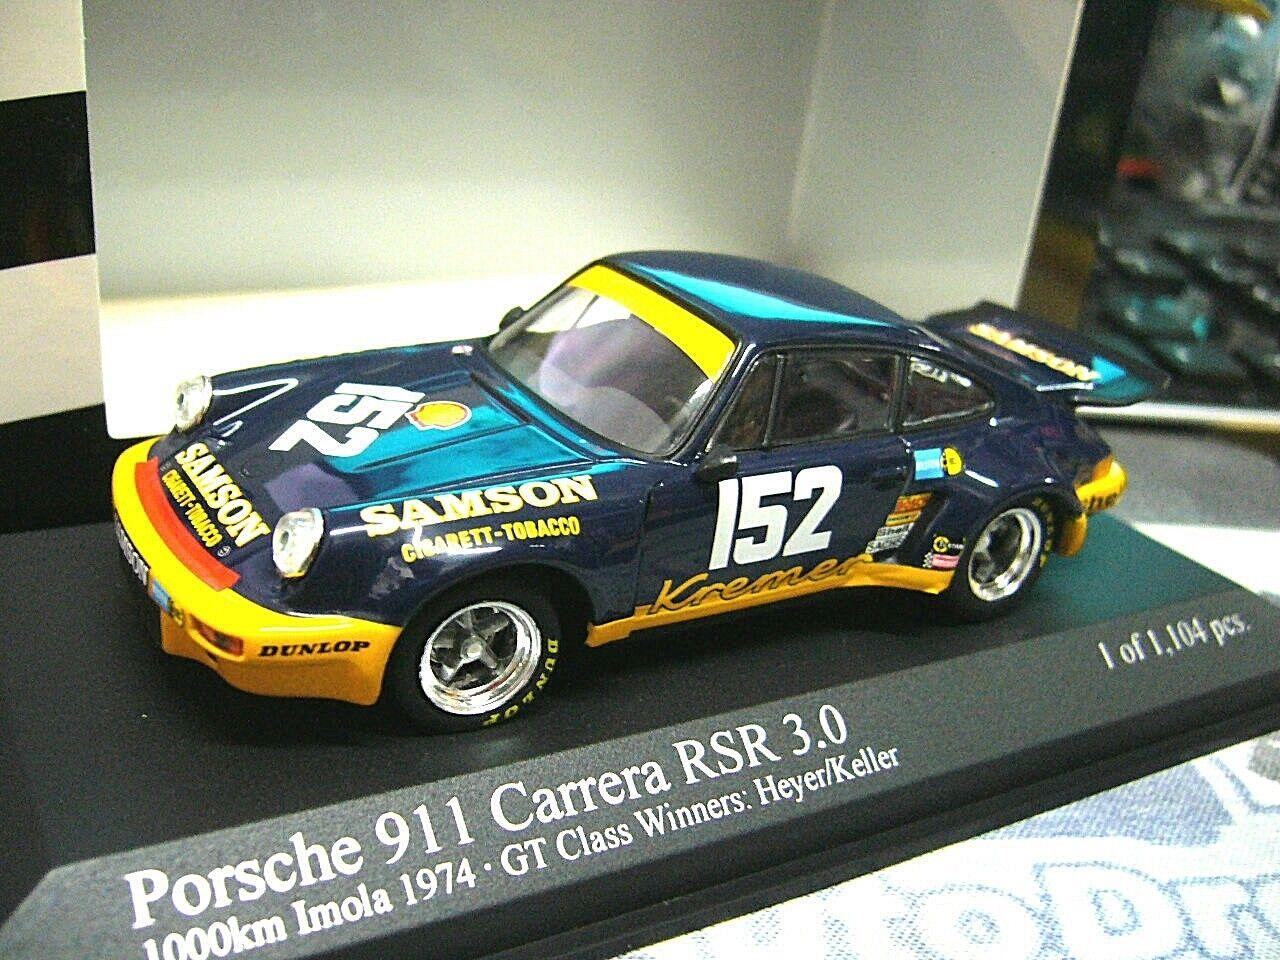 PORSCHE 911 Carrera RSR 3.0 DRM Samson Kremer Heyer  152 1974  Minichamps 1 43  | Ab dem neuesten Modell